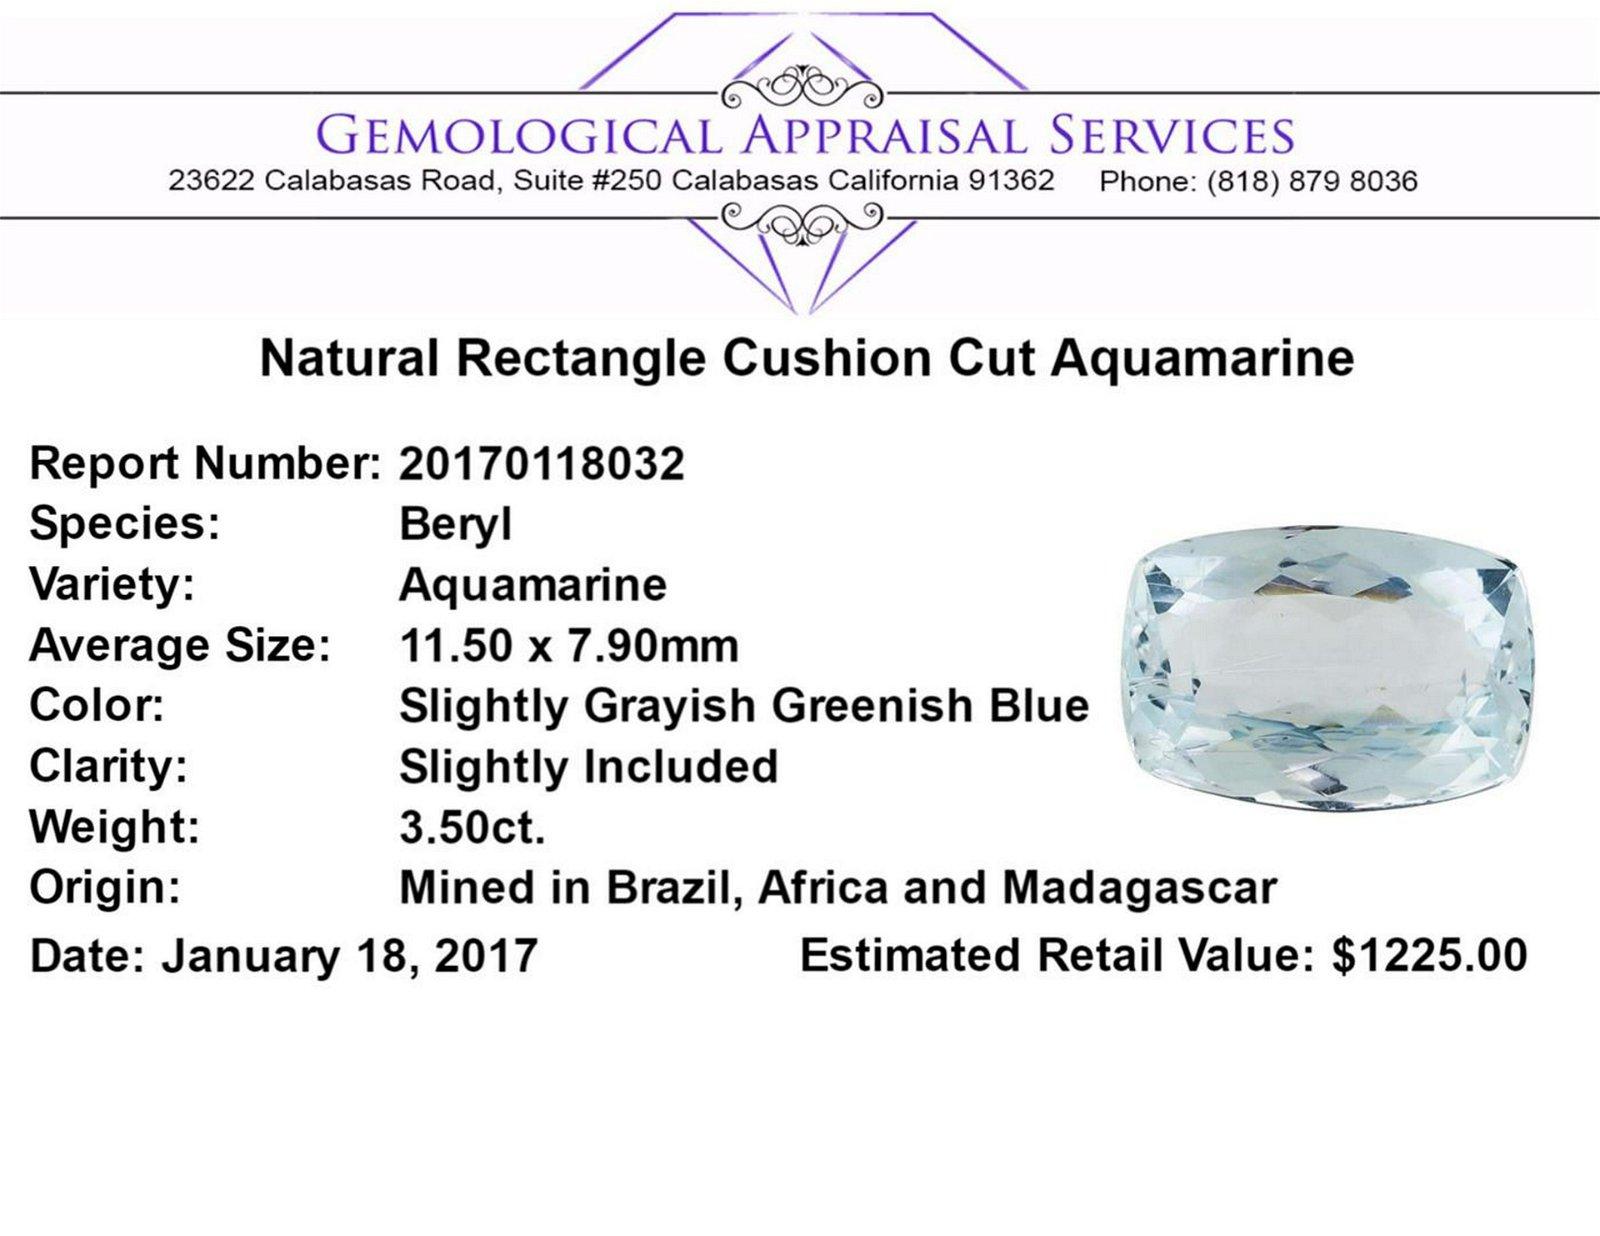 3.50 ct.Natural Rectangle Cushion Cut Aquamarine